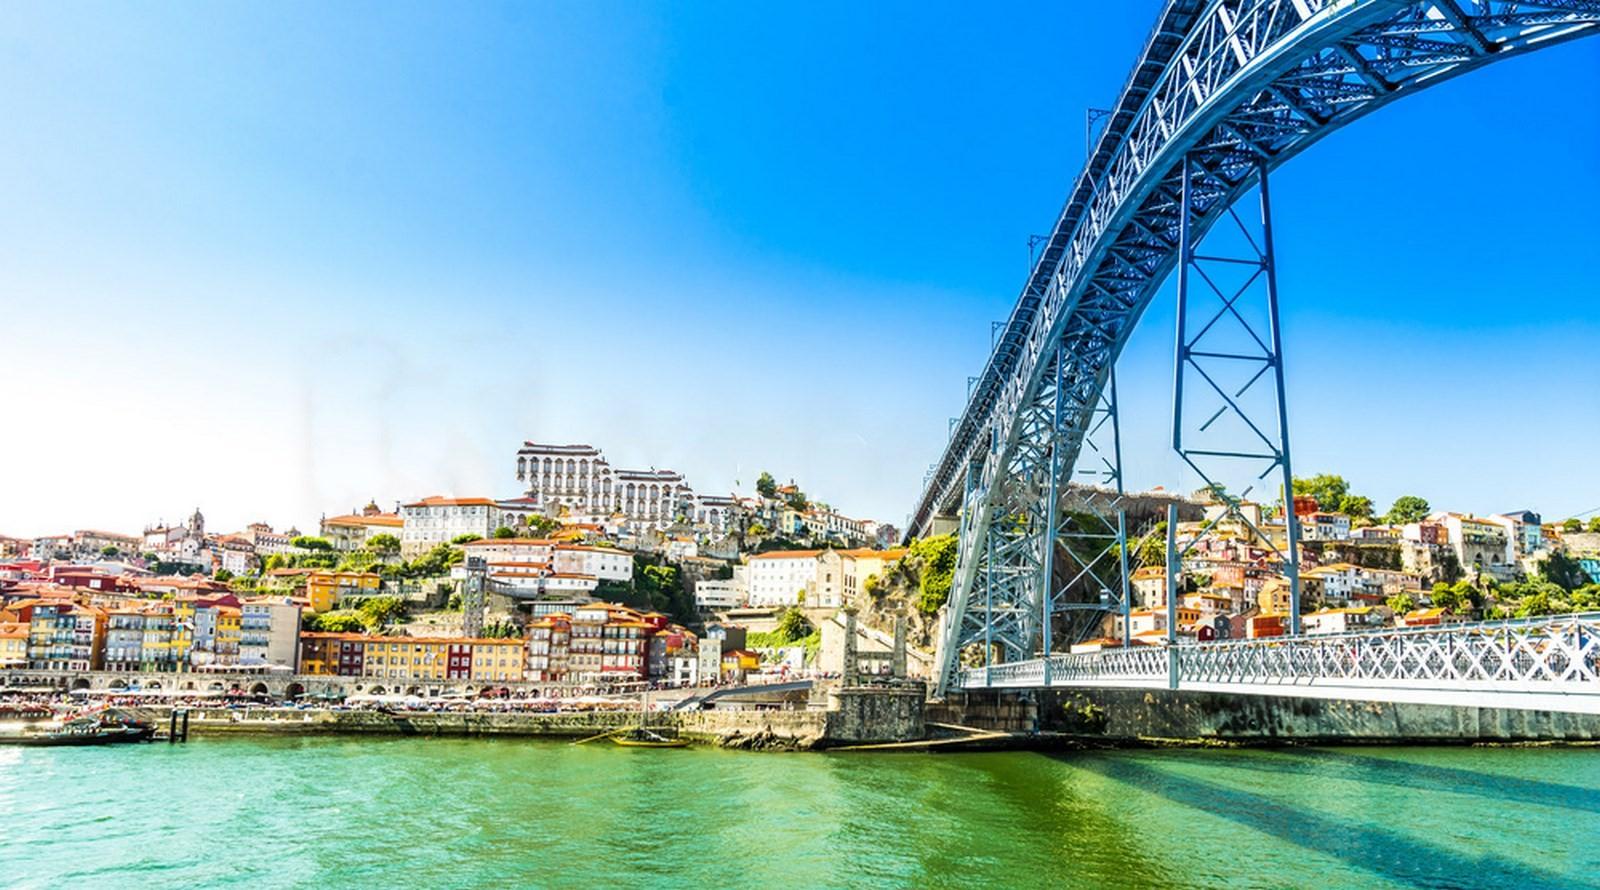 Maria pia bridge, Portugal - 1877 - Sheet3